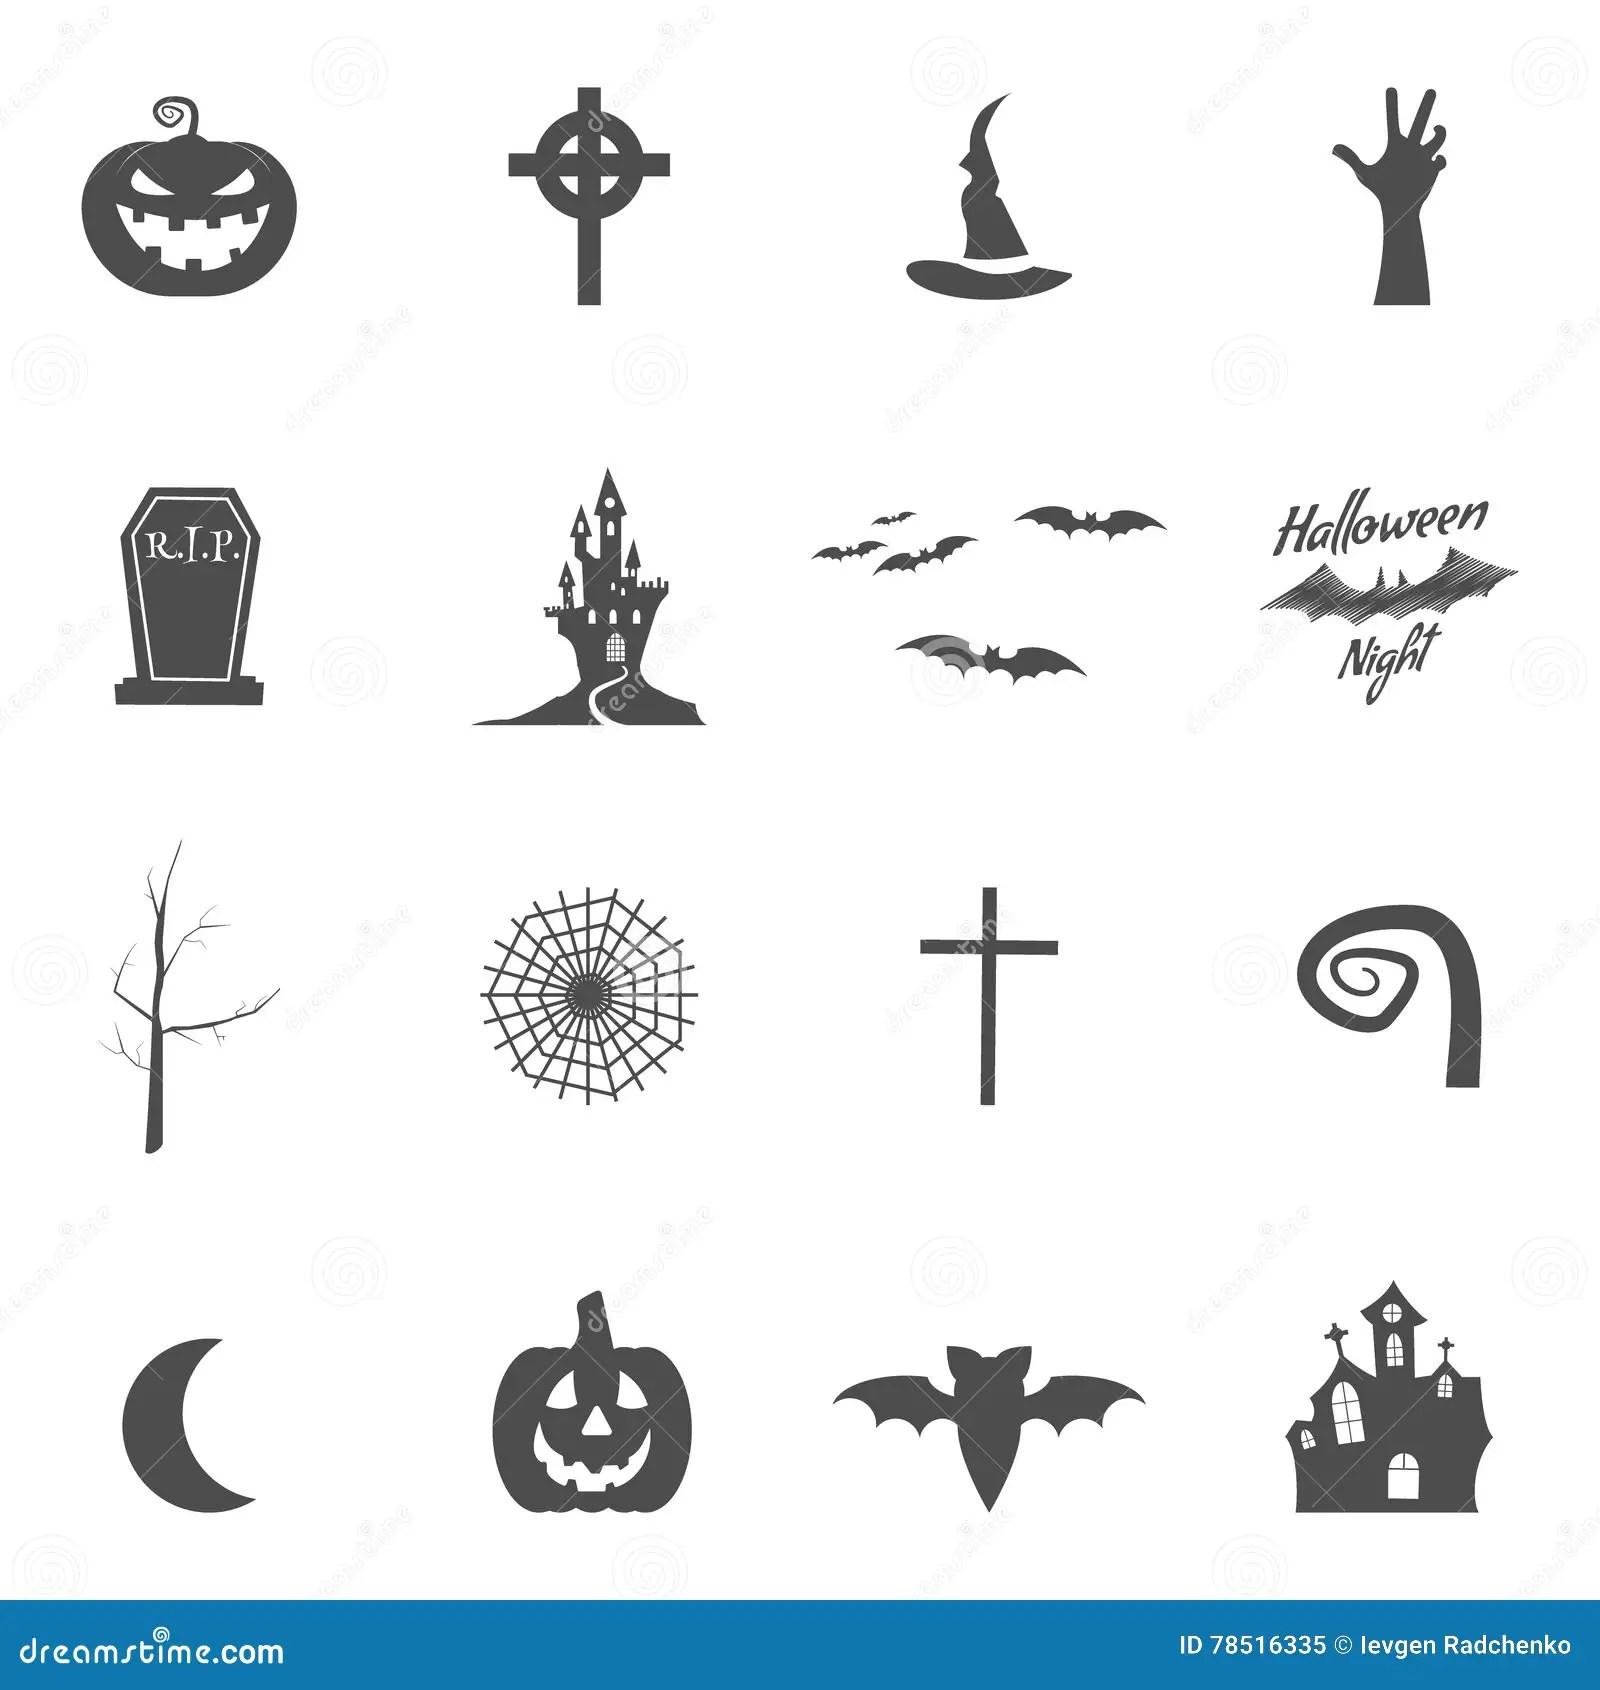 Set Of Halloween Design Creation Tool Kit Icons Isolate